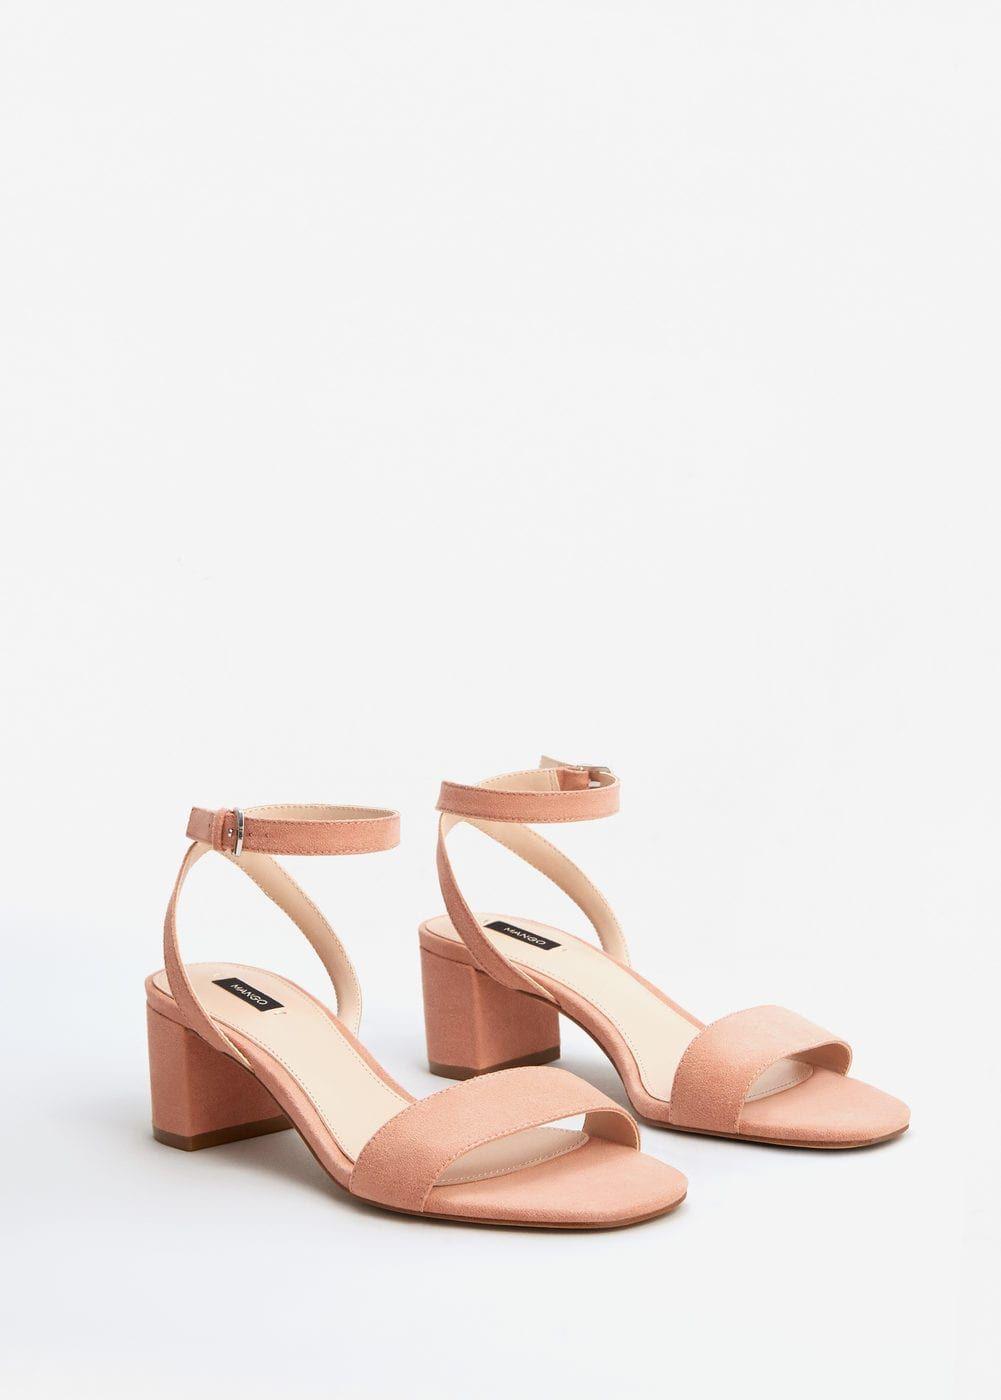 4fd9f9482 Ankle-cuff sandals - Women